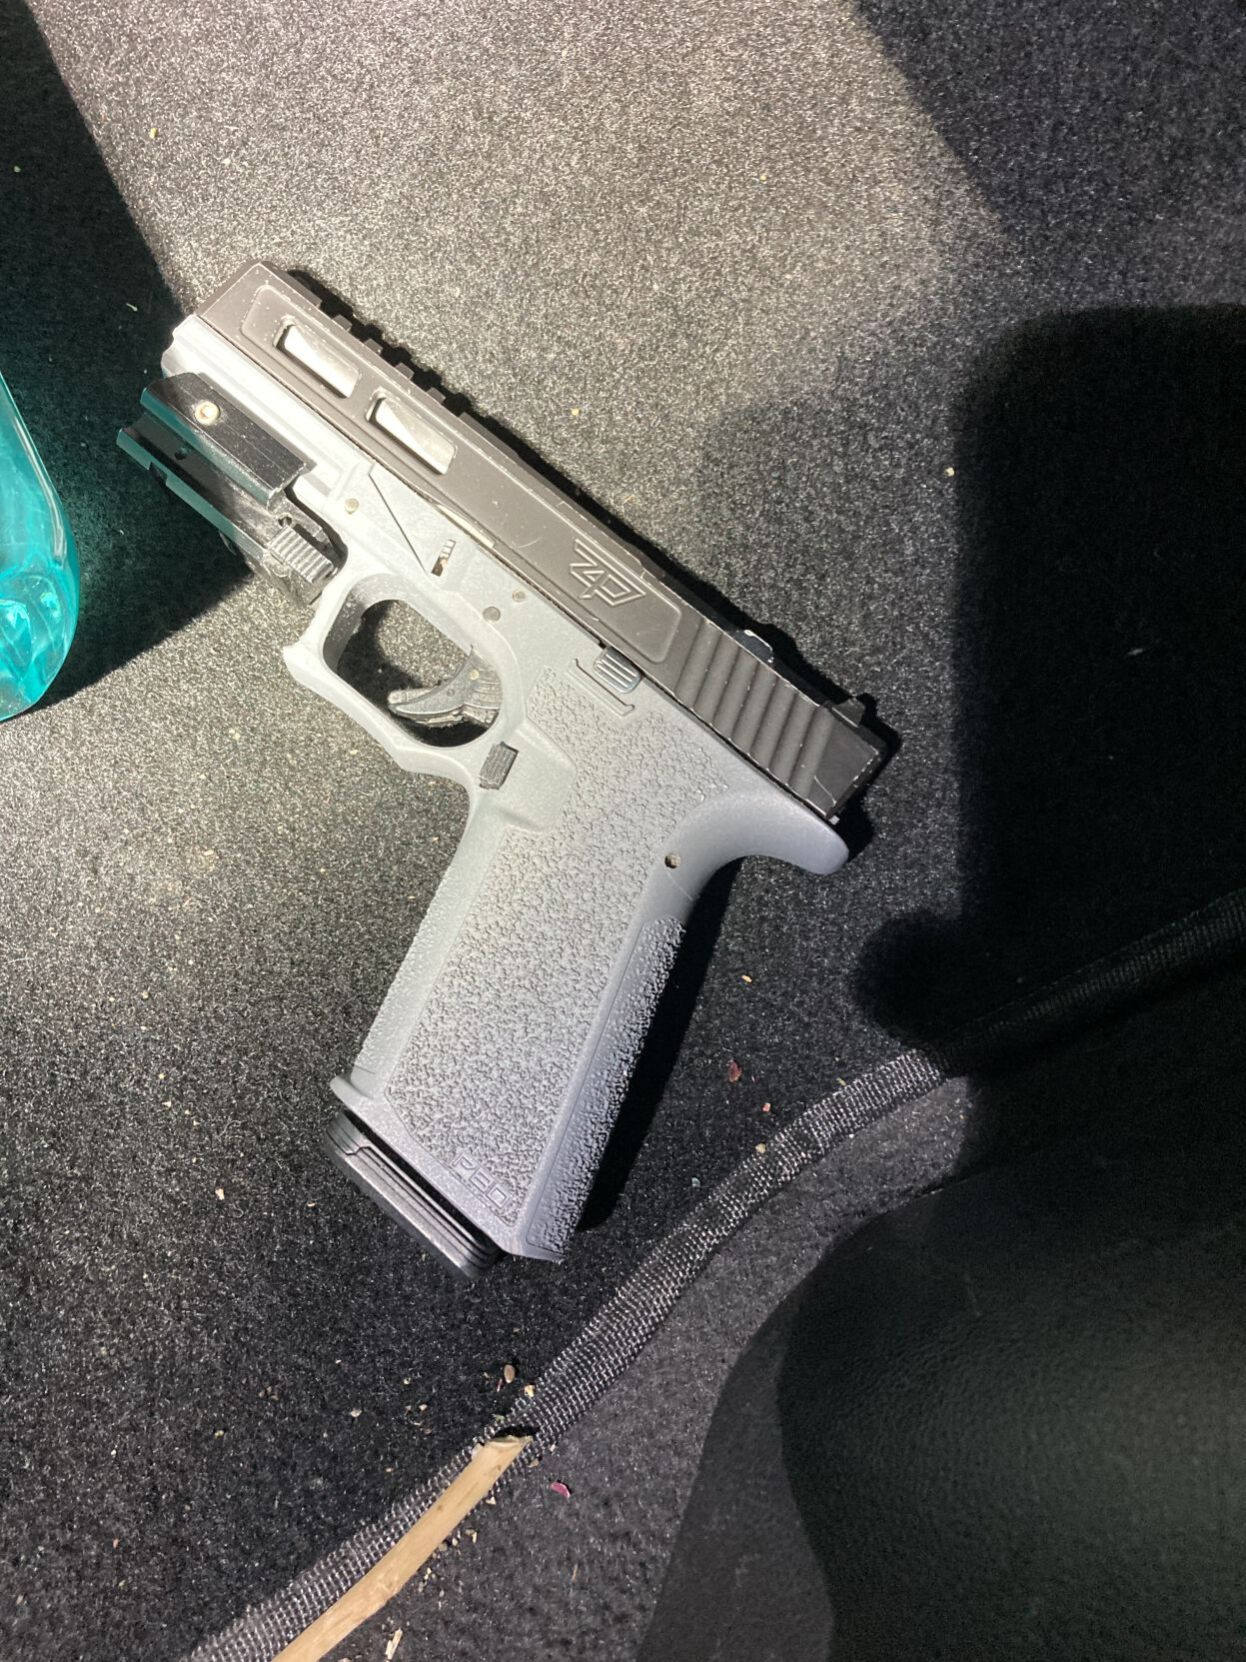 050521 ghost gun 9mm.JPG